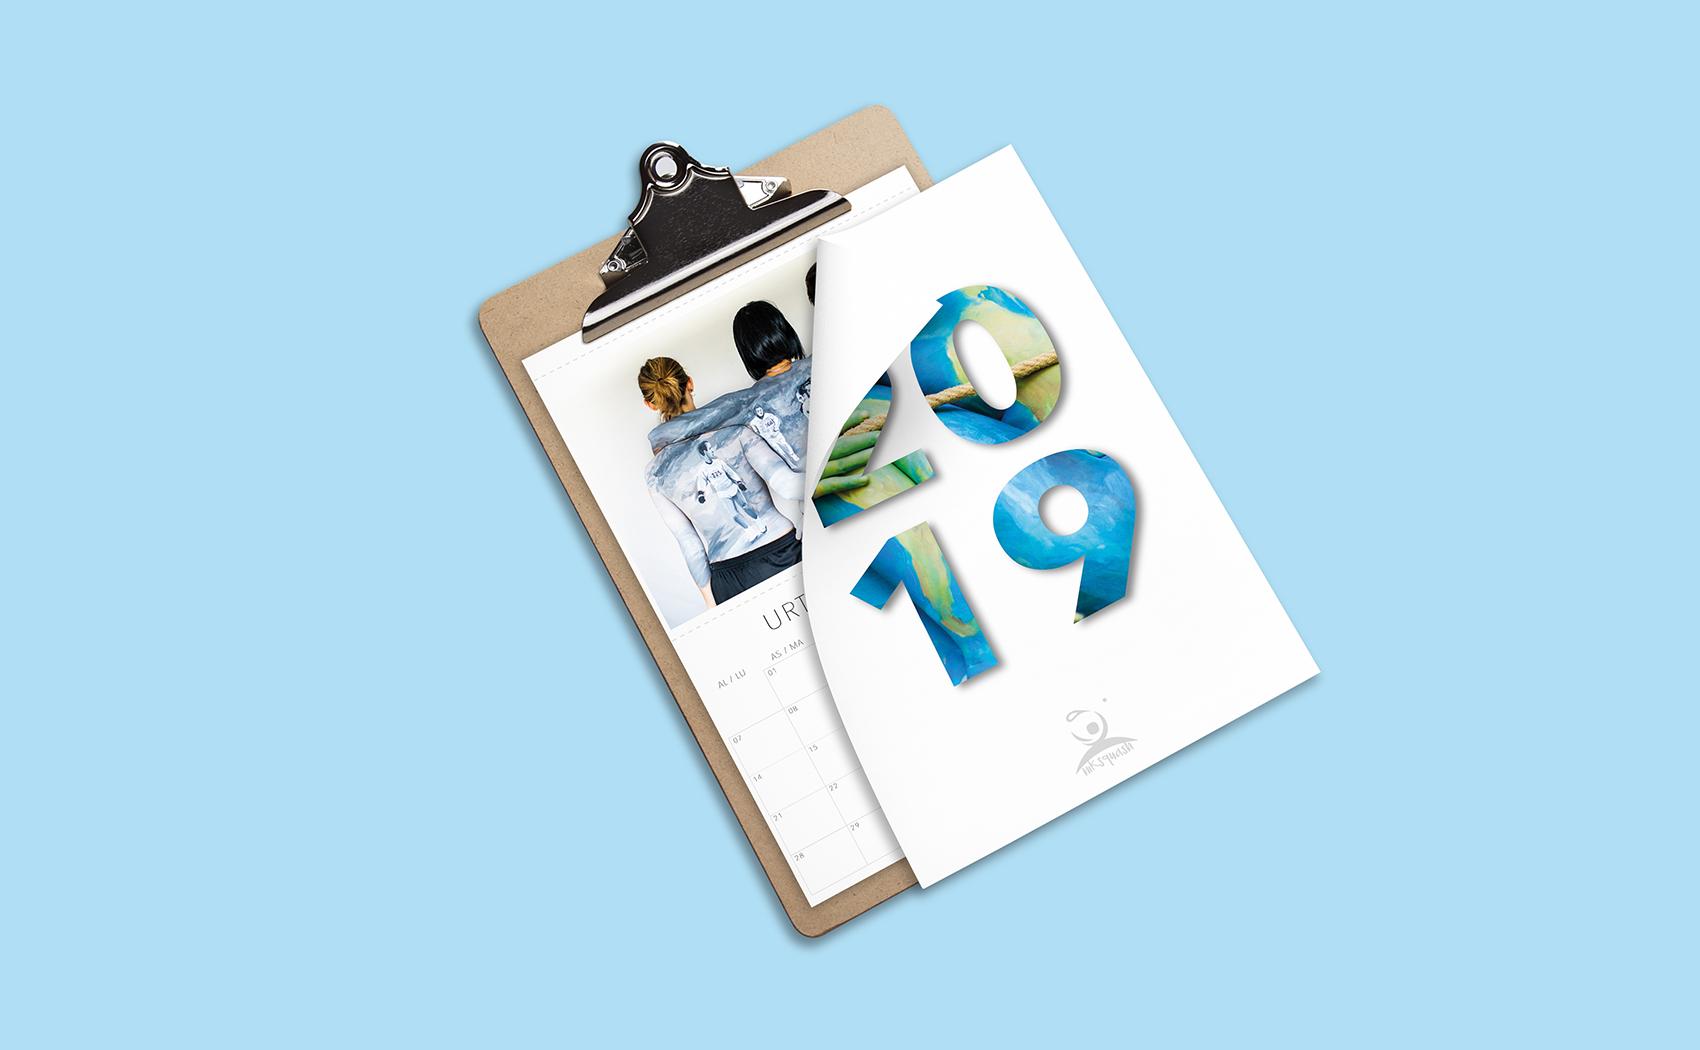 diseño-maquetacion-calendario-niksquash-bilbao-deusto-trlt-trilatera